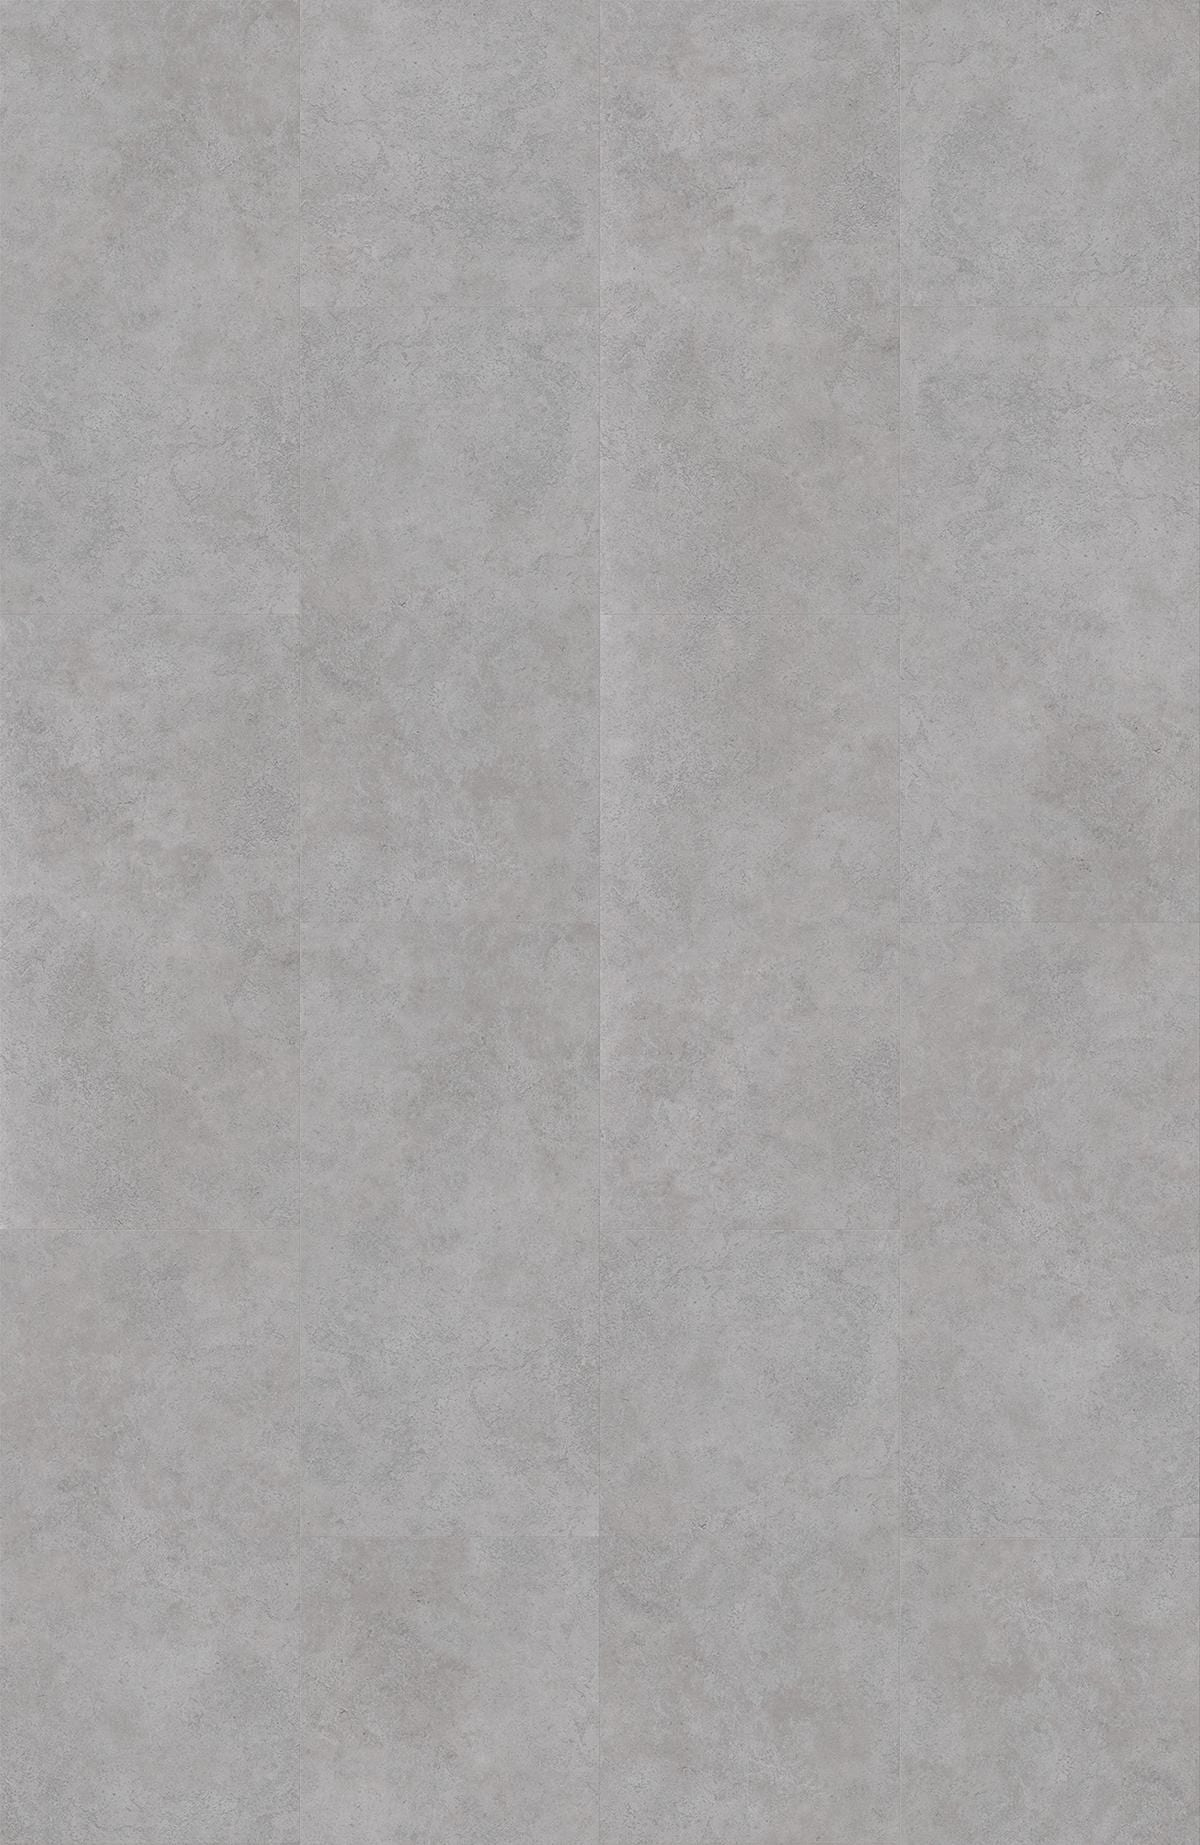 parador klick vinyl basic 4 3 beton grau online kaufen. Black Bedroom Furniture Sets. Home Design Ideas